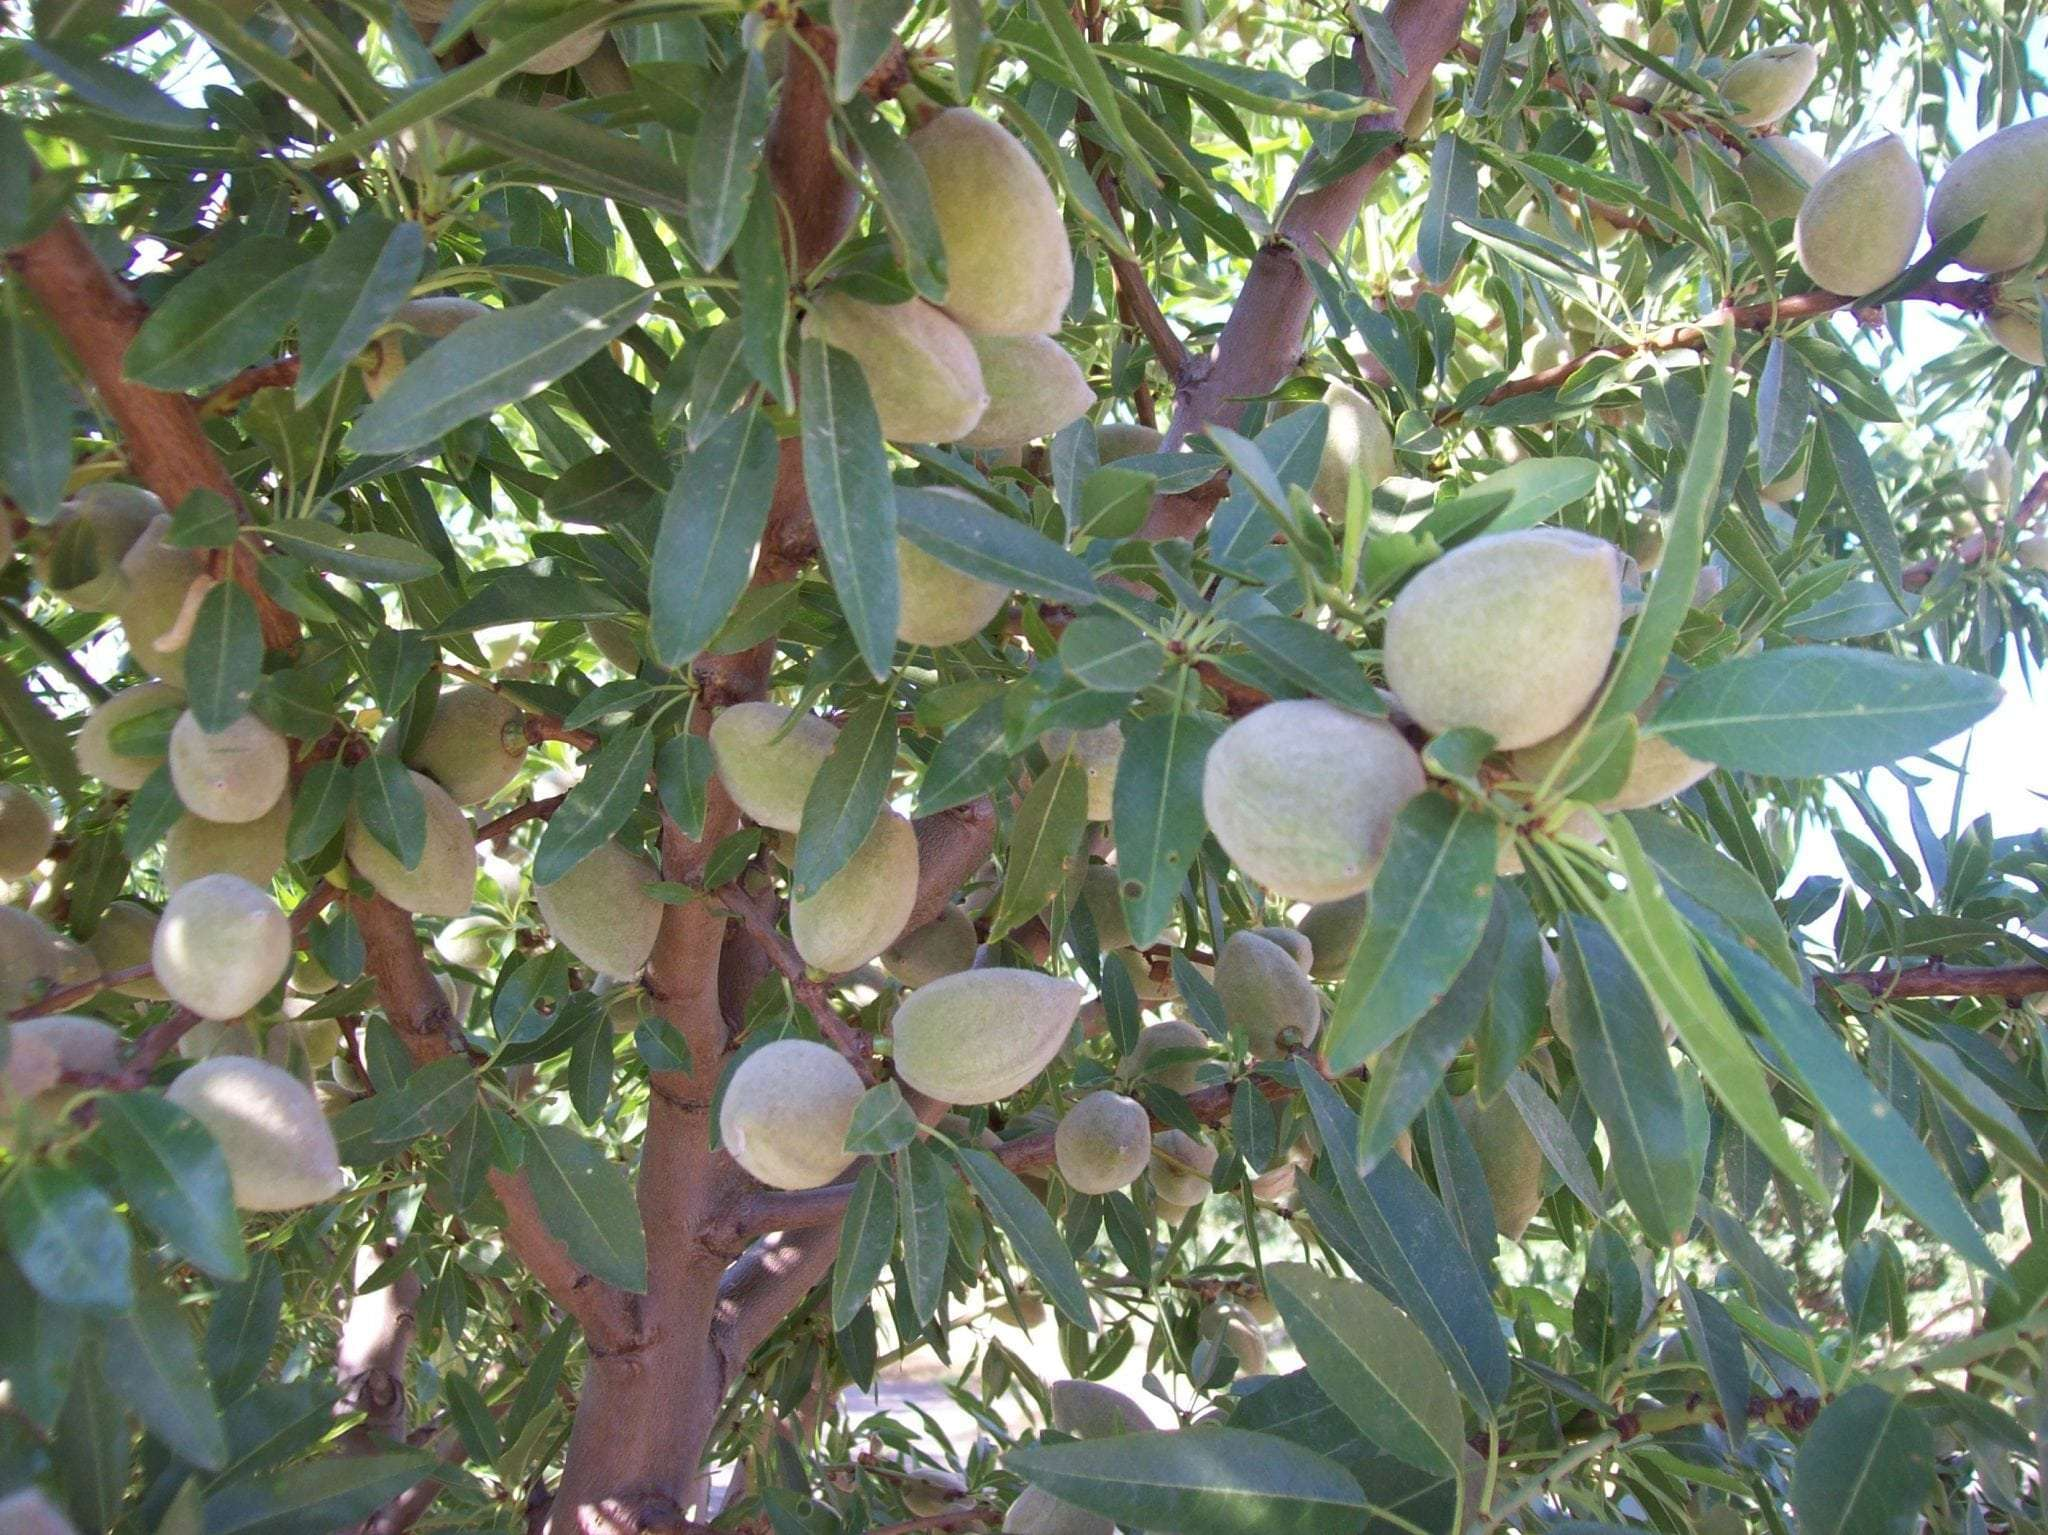 39.49 Acres Independence Almonds, Kingsburg